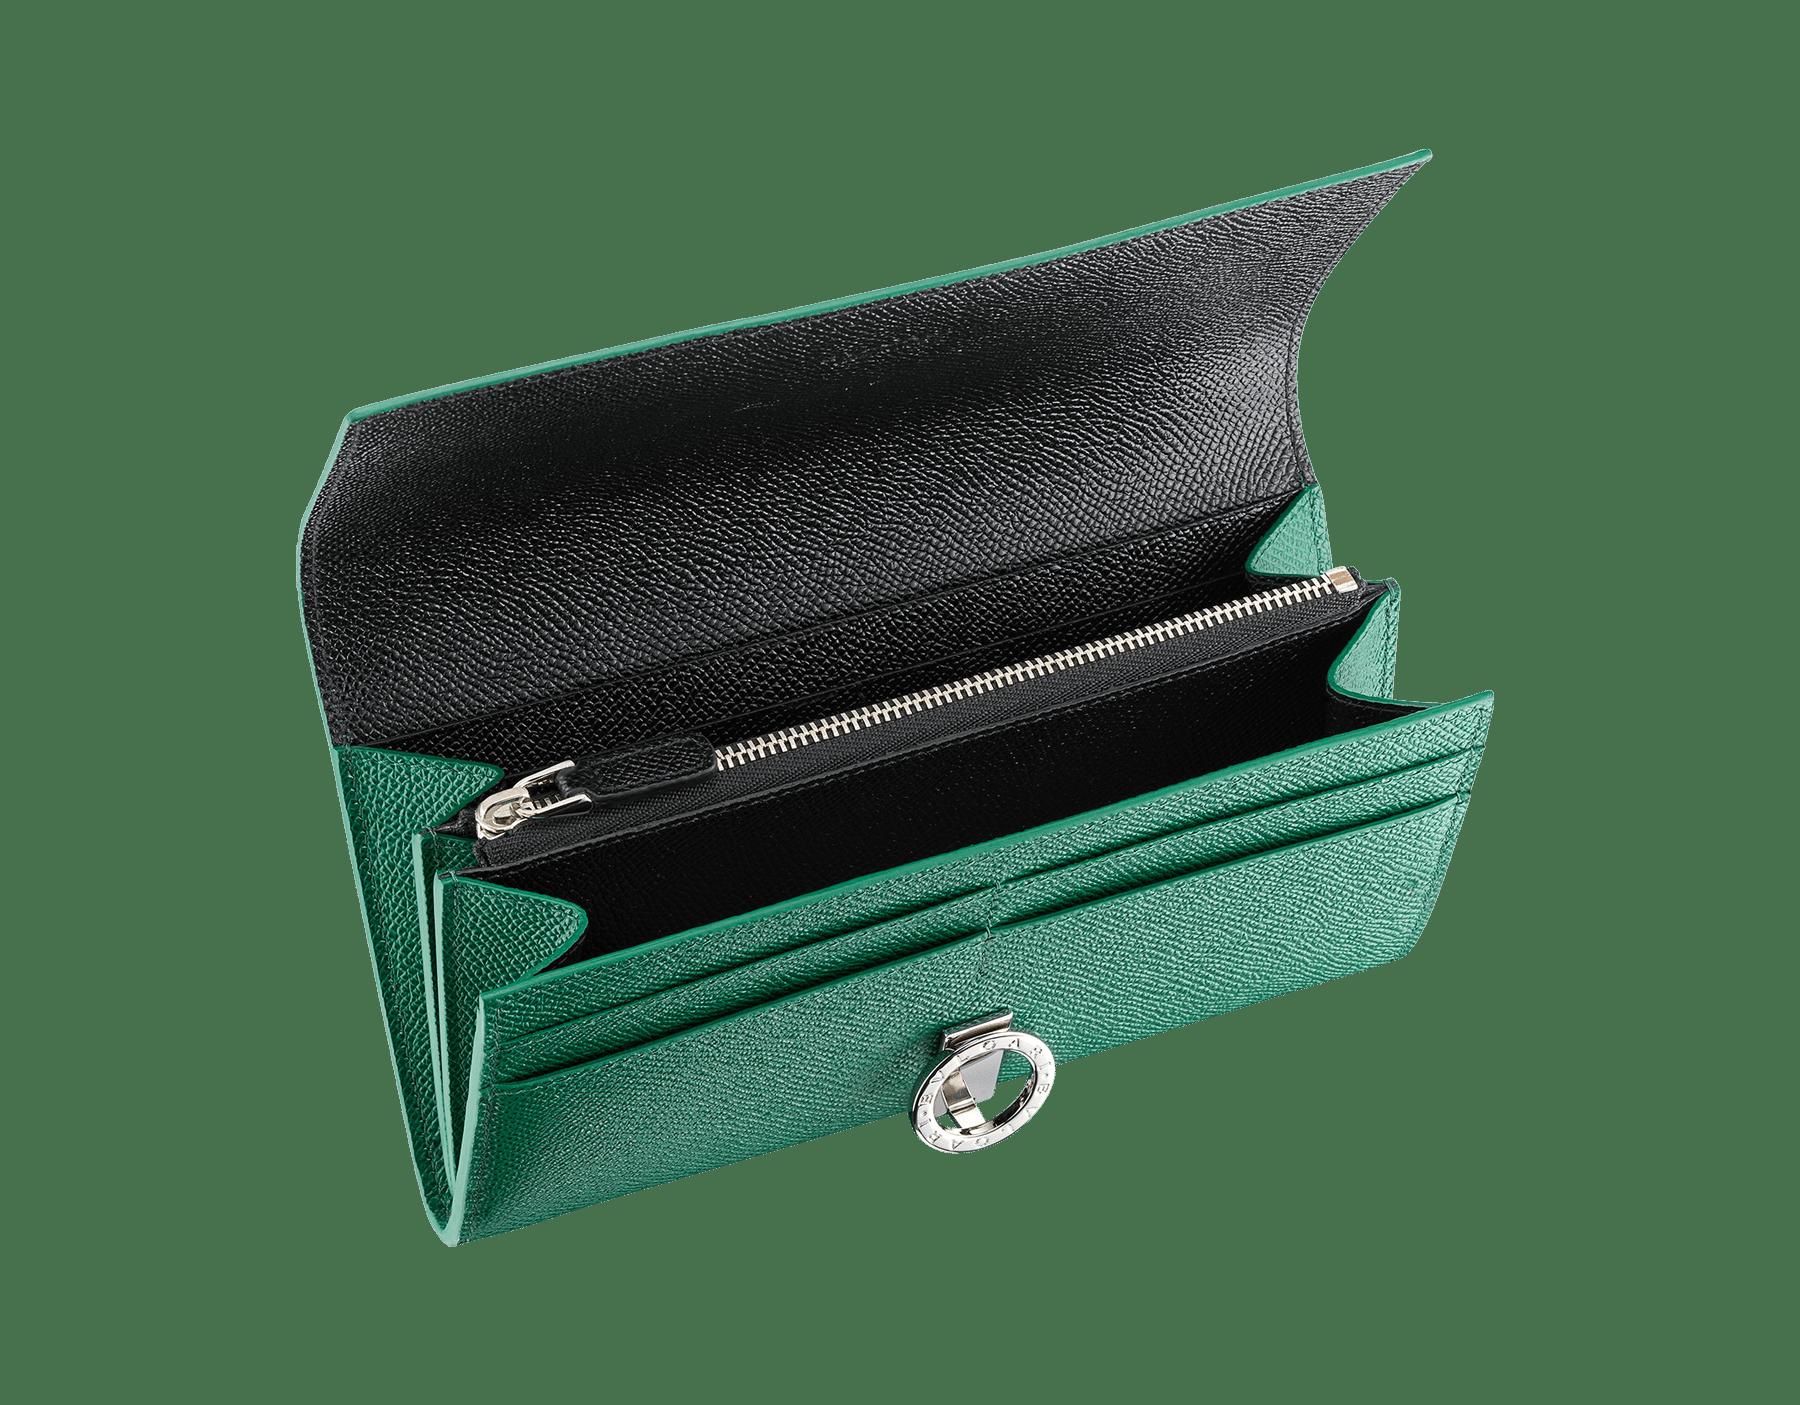 BVLGARI BVLGARI wallet pochette in emerald green and black grain calf leather. Iconic logo clip closure in palladium-plated brass. 289379 image 2